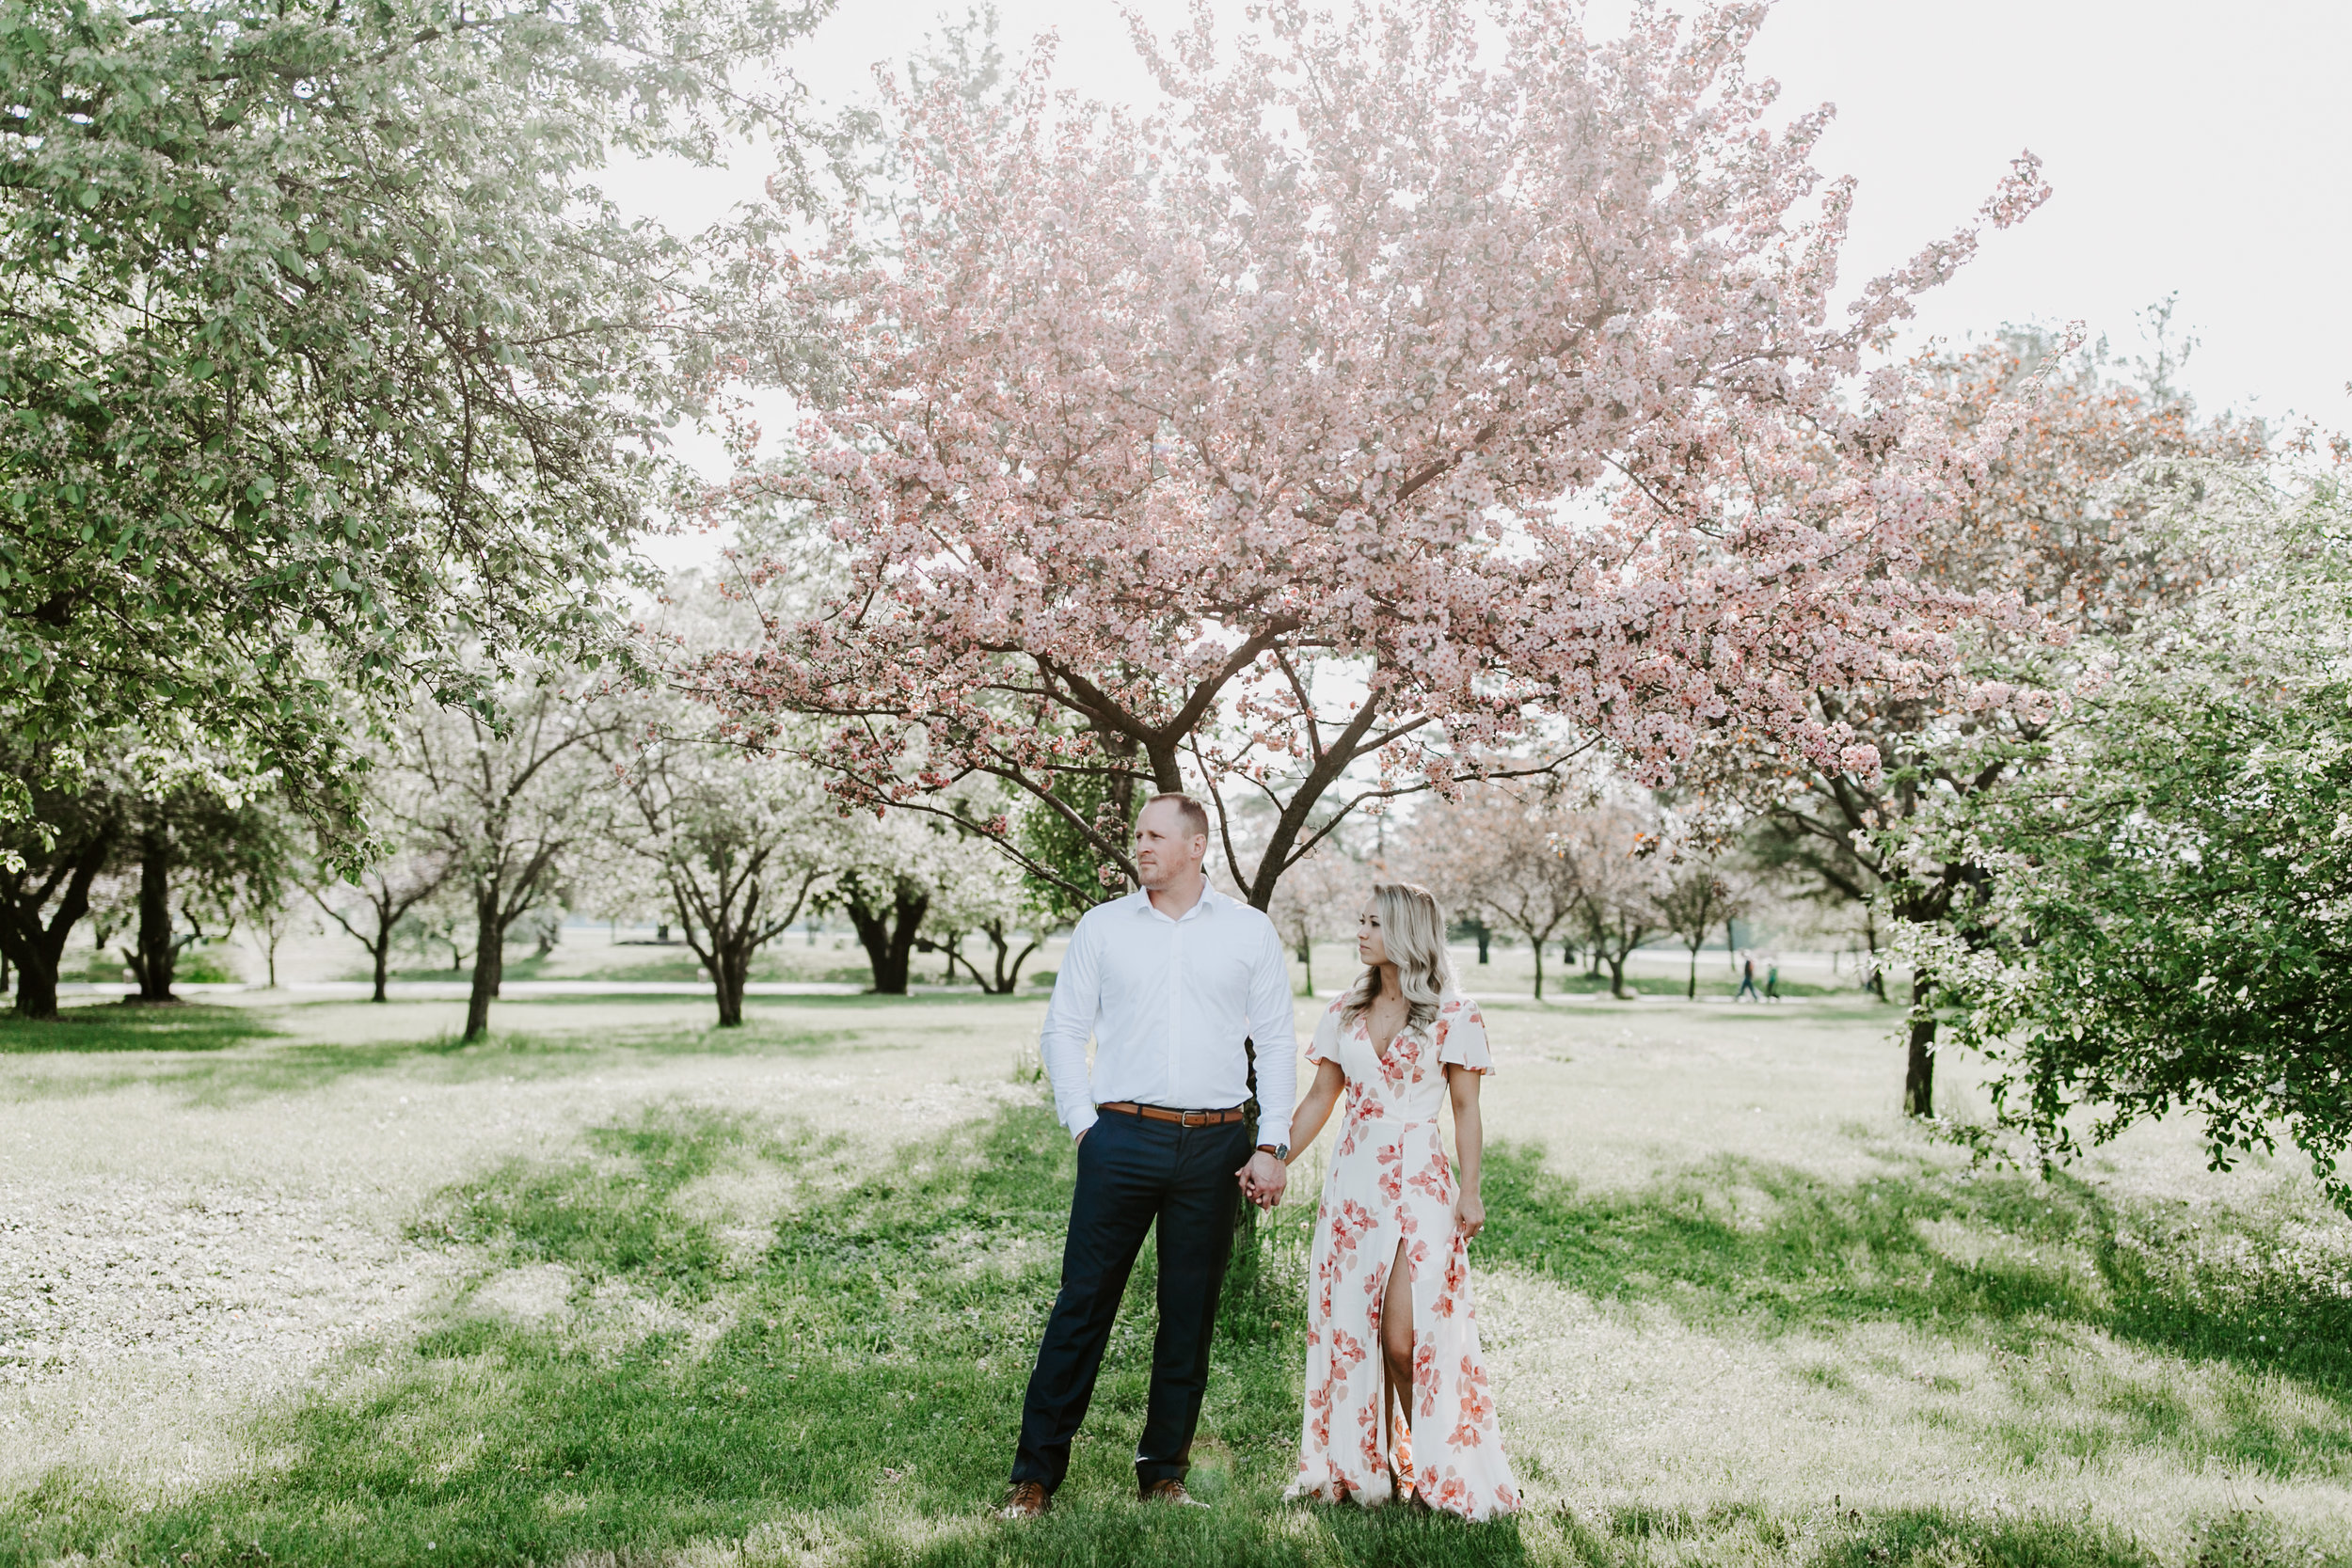 gracetphotography-wedding-photographer-adventure-bride-engagement-midwest-15.jpg